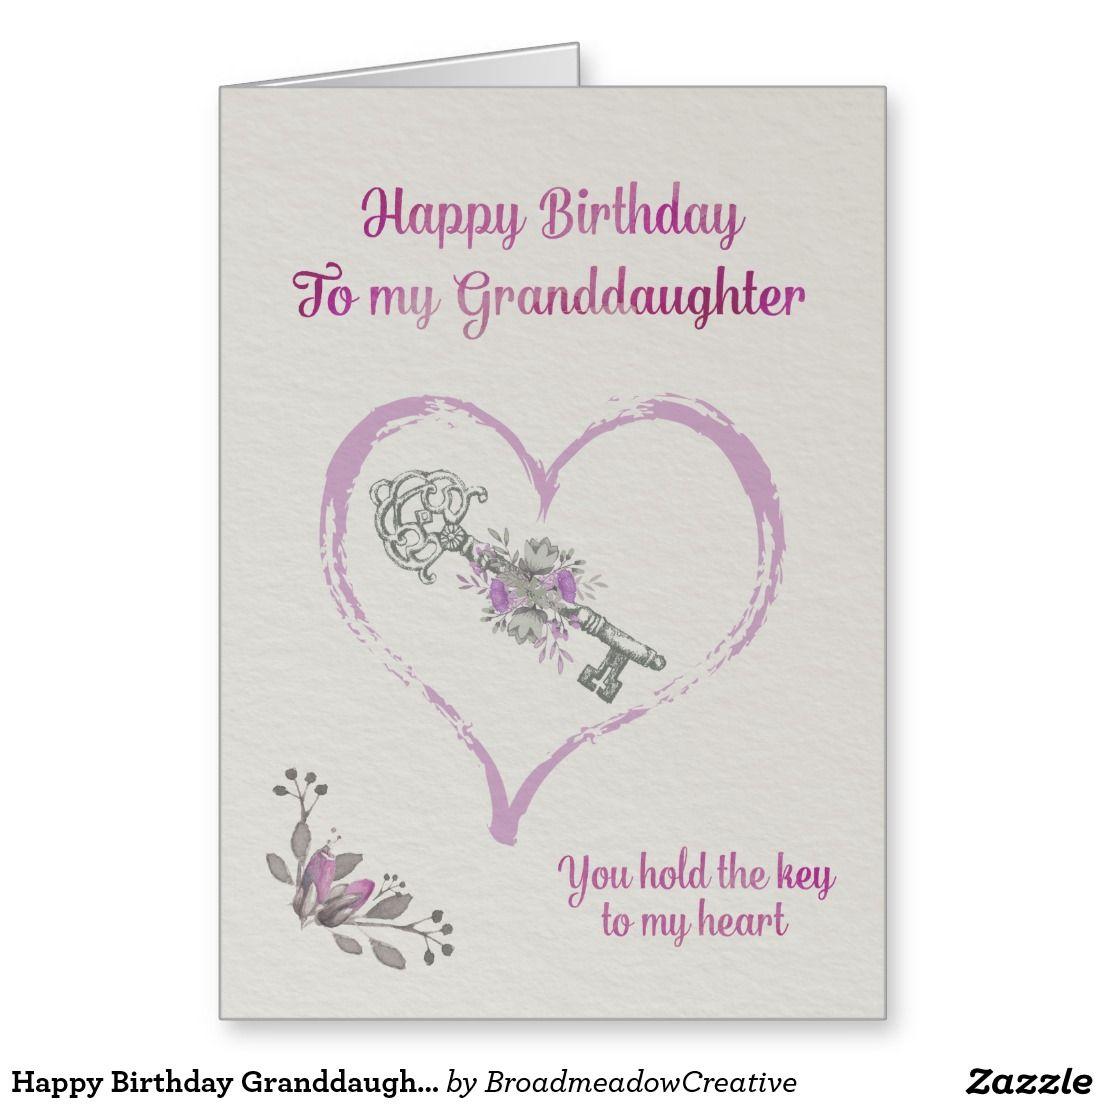 Happy Birthday Granddaughter Card Zazzle.co.uk Happy